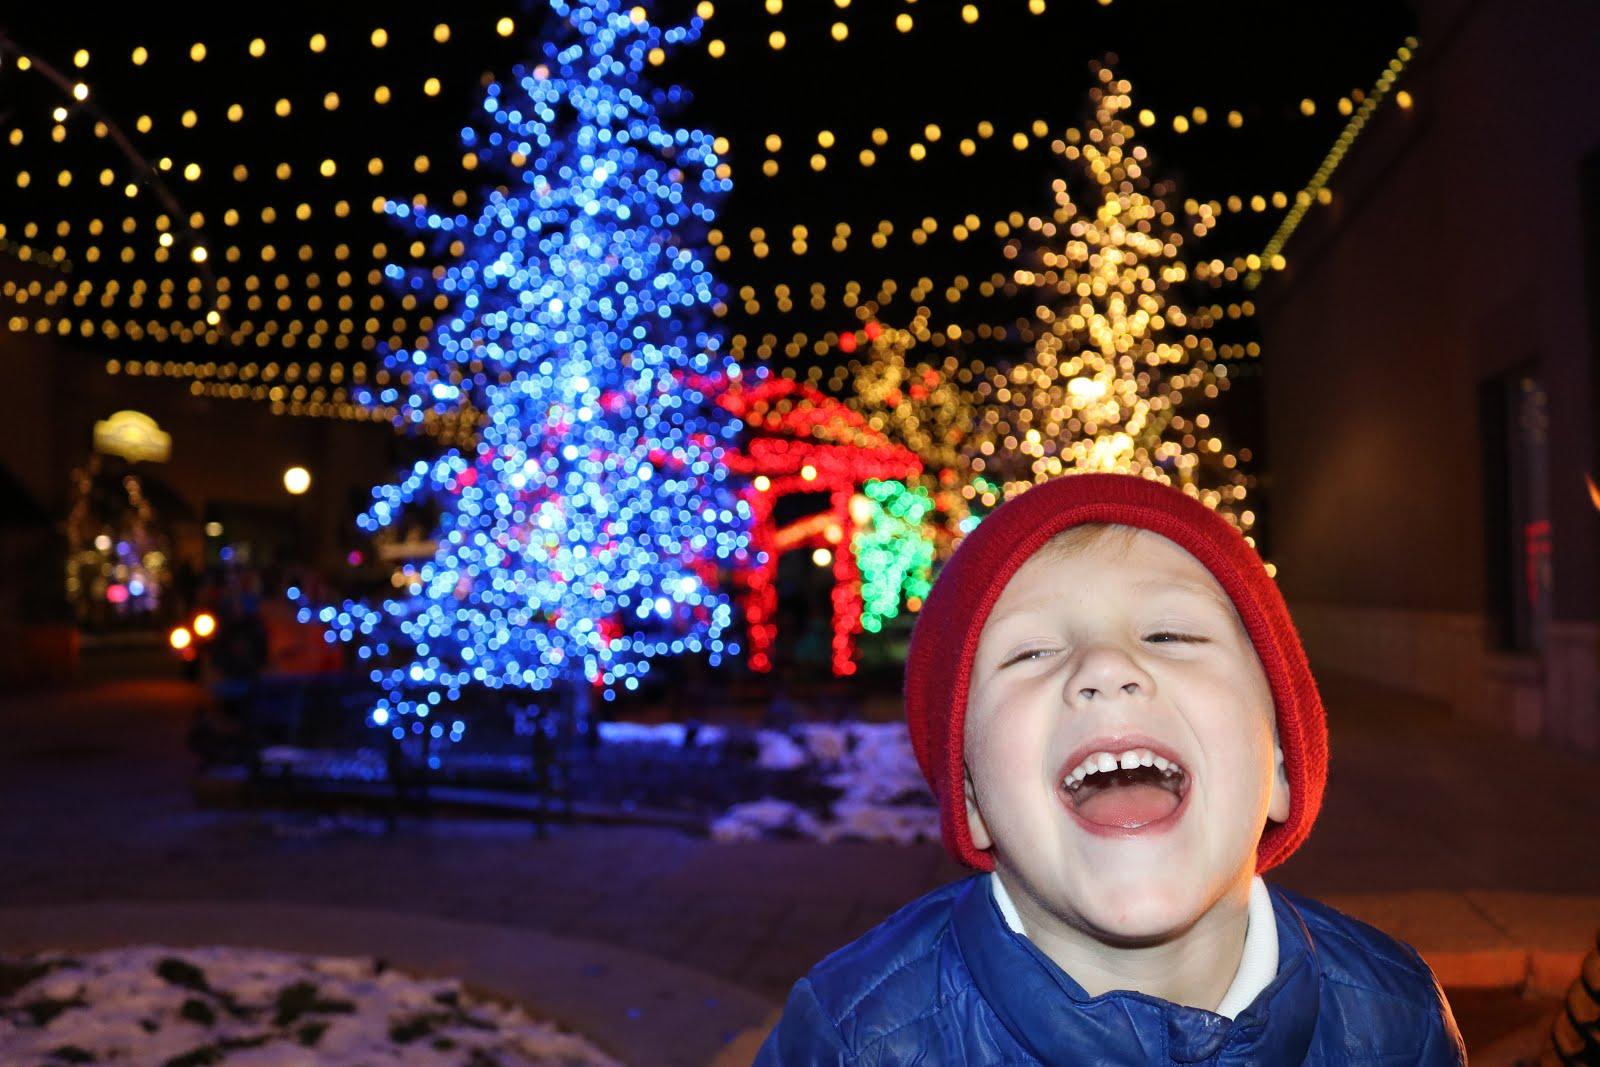 The Grubers: December 2016 - Christmas Activities & Jim Gaffigan